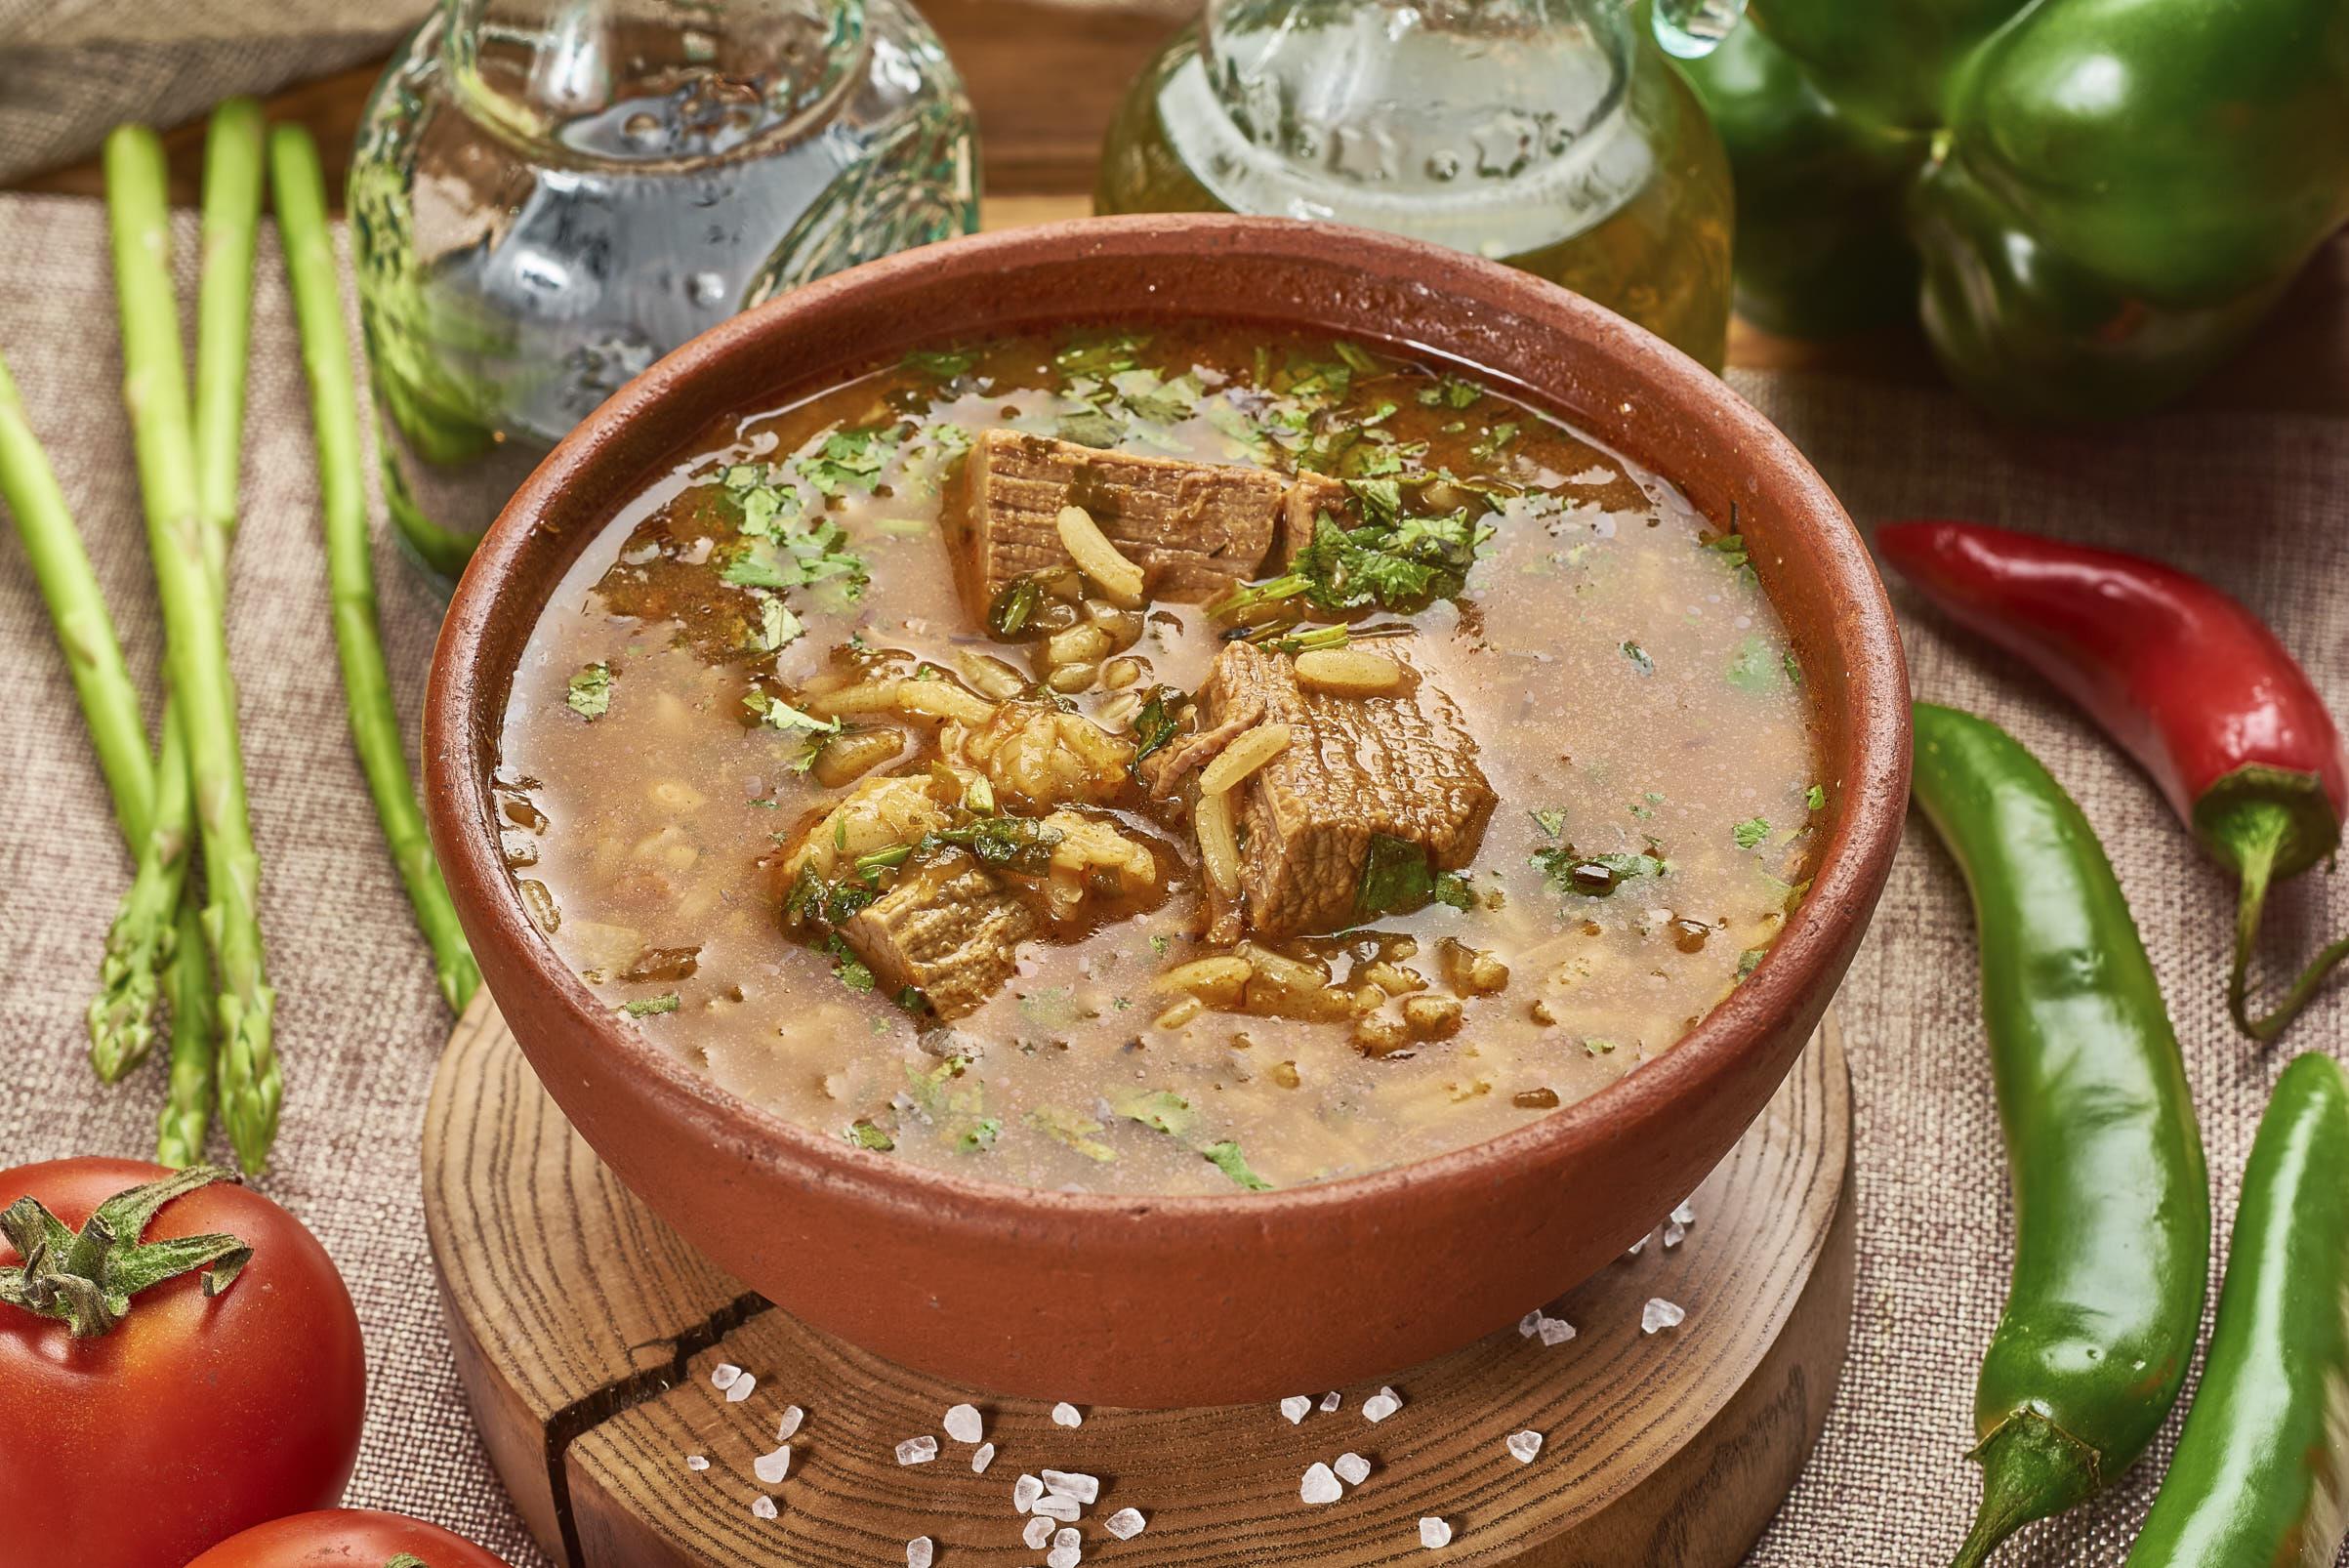 Суп харчо рецепт приготовления с фото